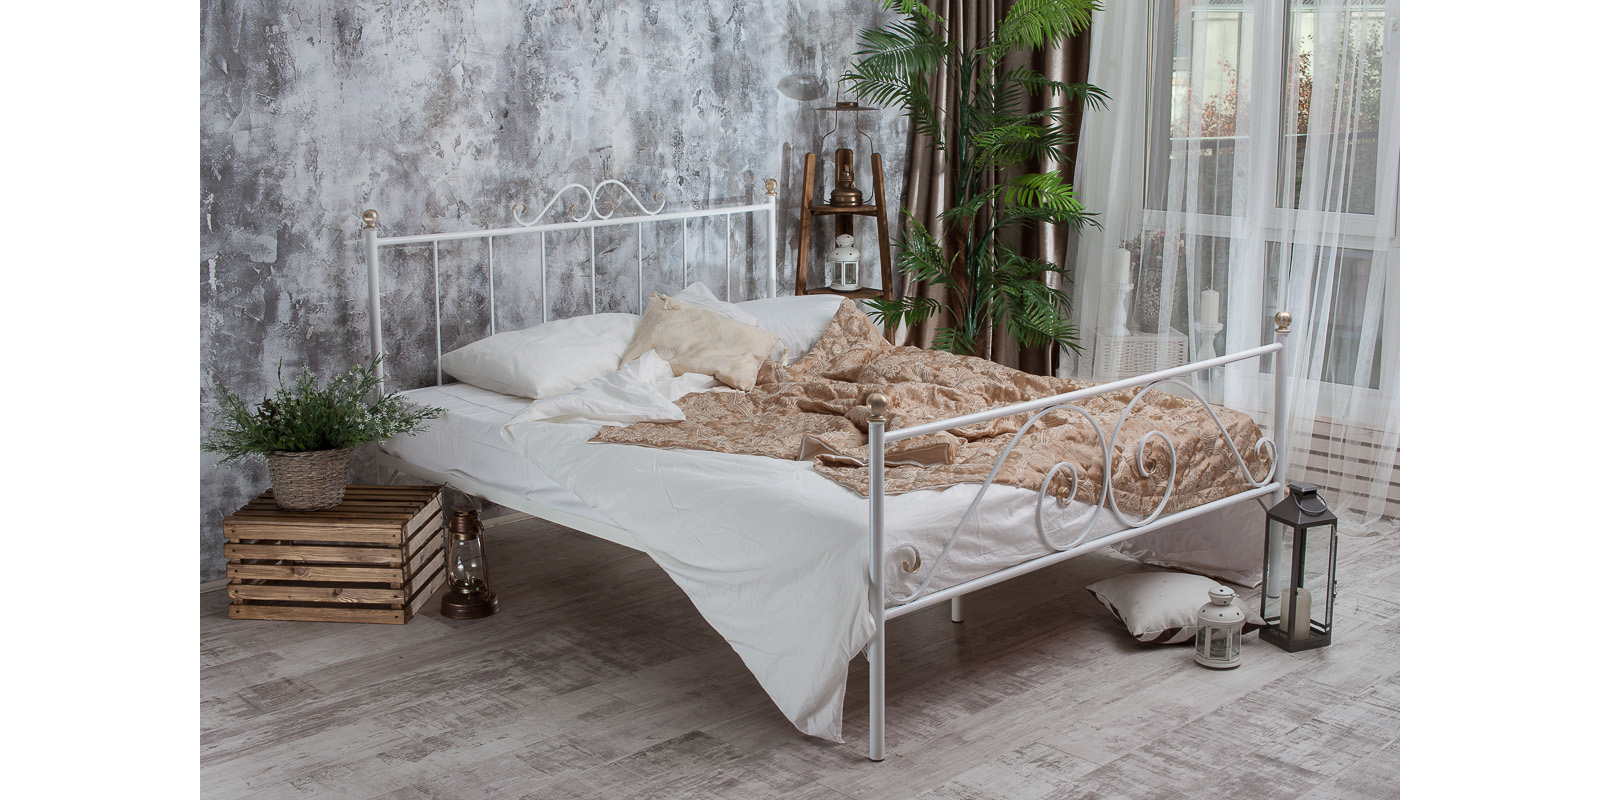 Кровать HomeMe Оливия от Homeme.ru